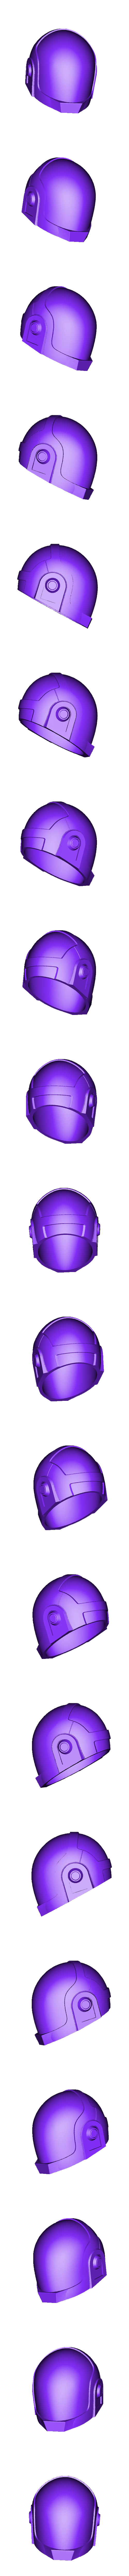 guy_manuel_daft_punk_helmet.stl Download free STL file Guy Manuel from Daft Punk Helmet • Object to 3D print, Zortrax